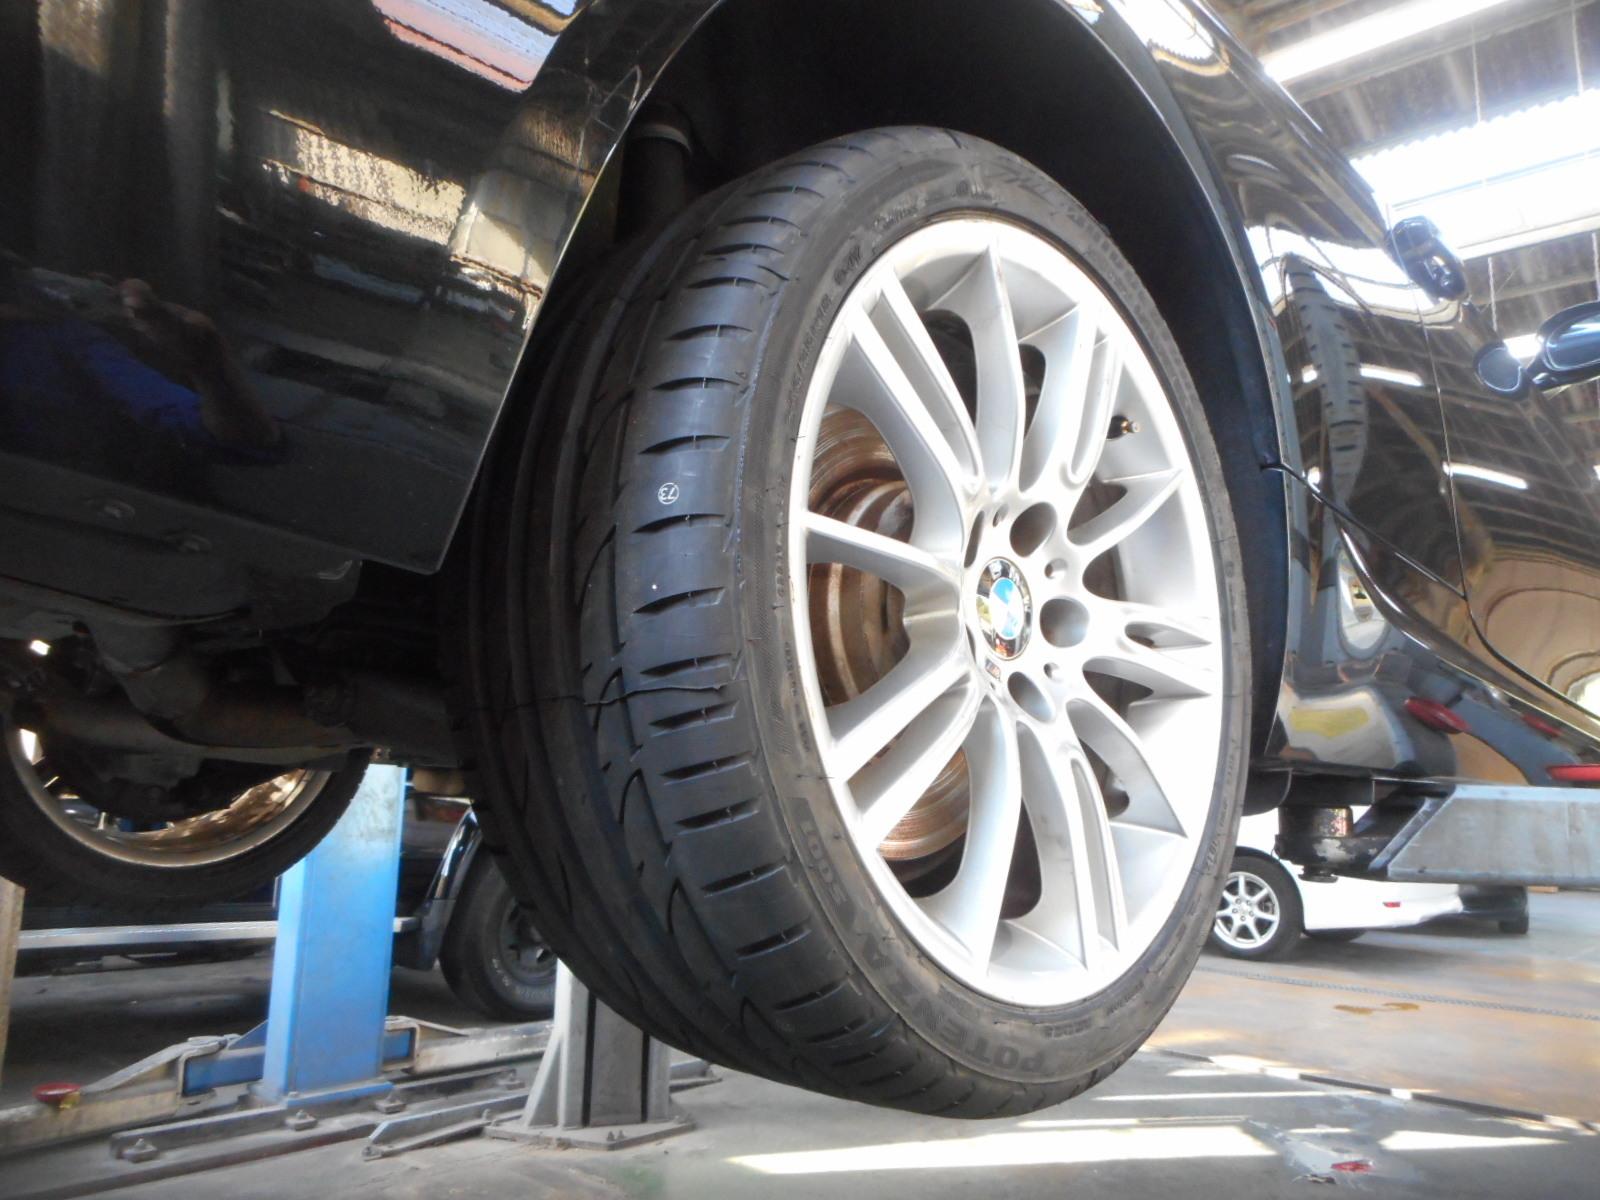 BMW335 クーペ (E90) エンジンオイル漏れ修理 納車整備_c0267693_17112027.jpg